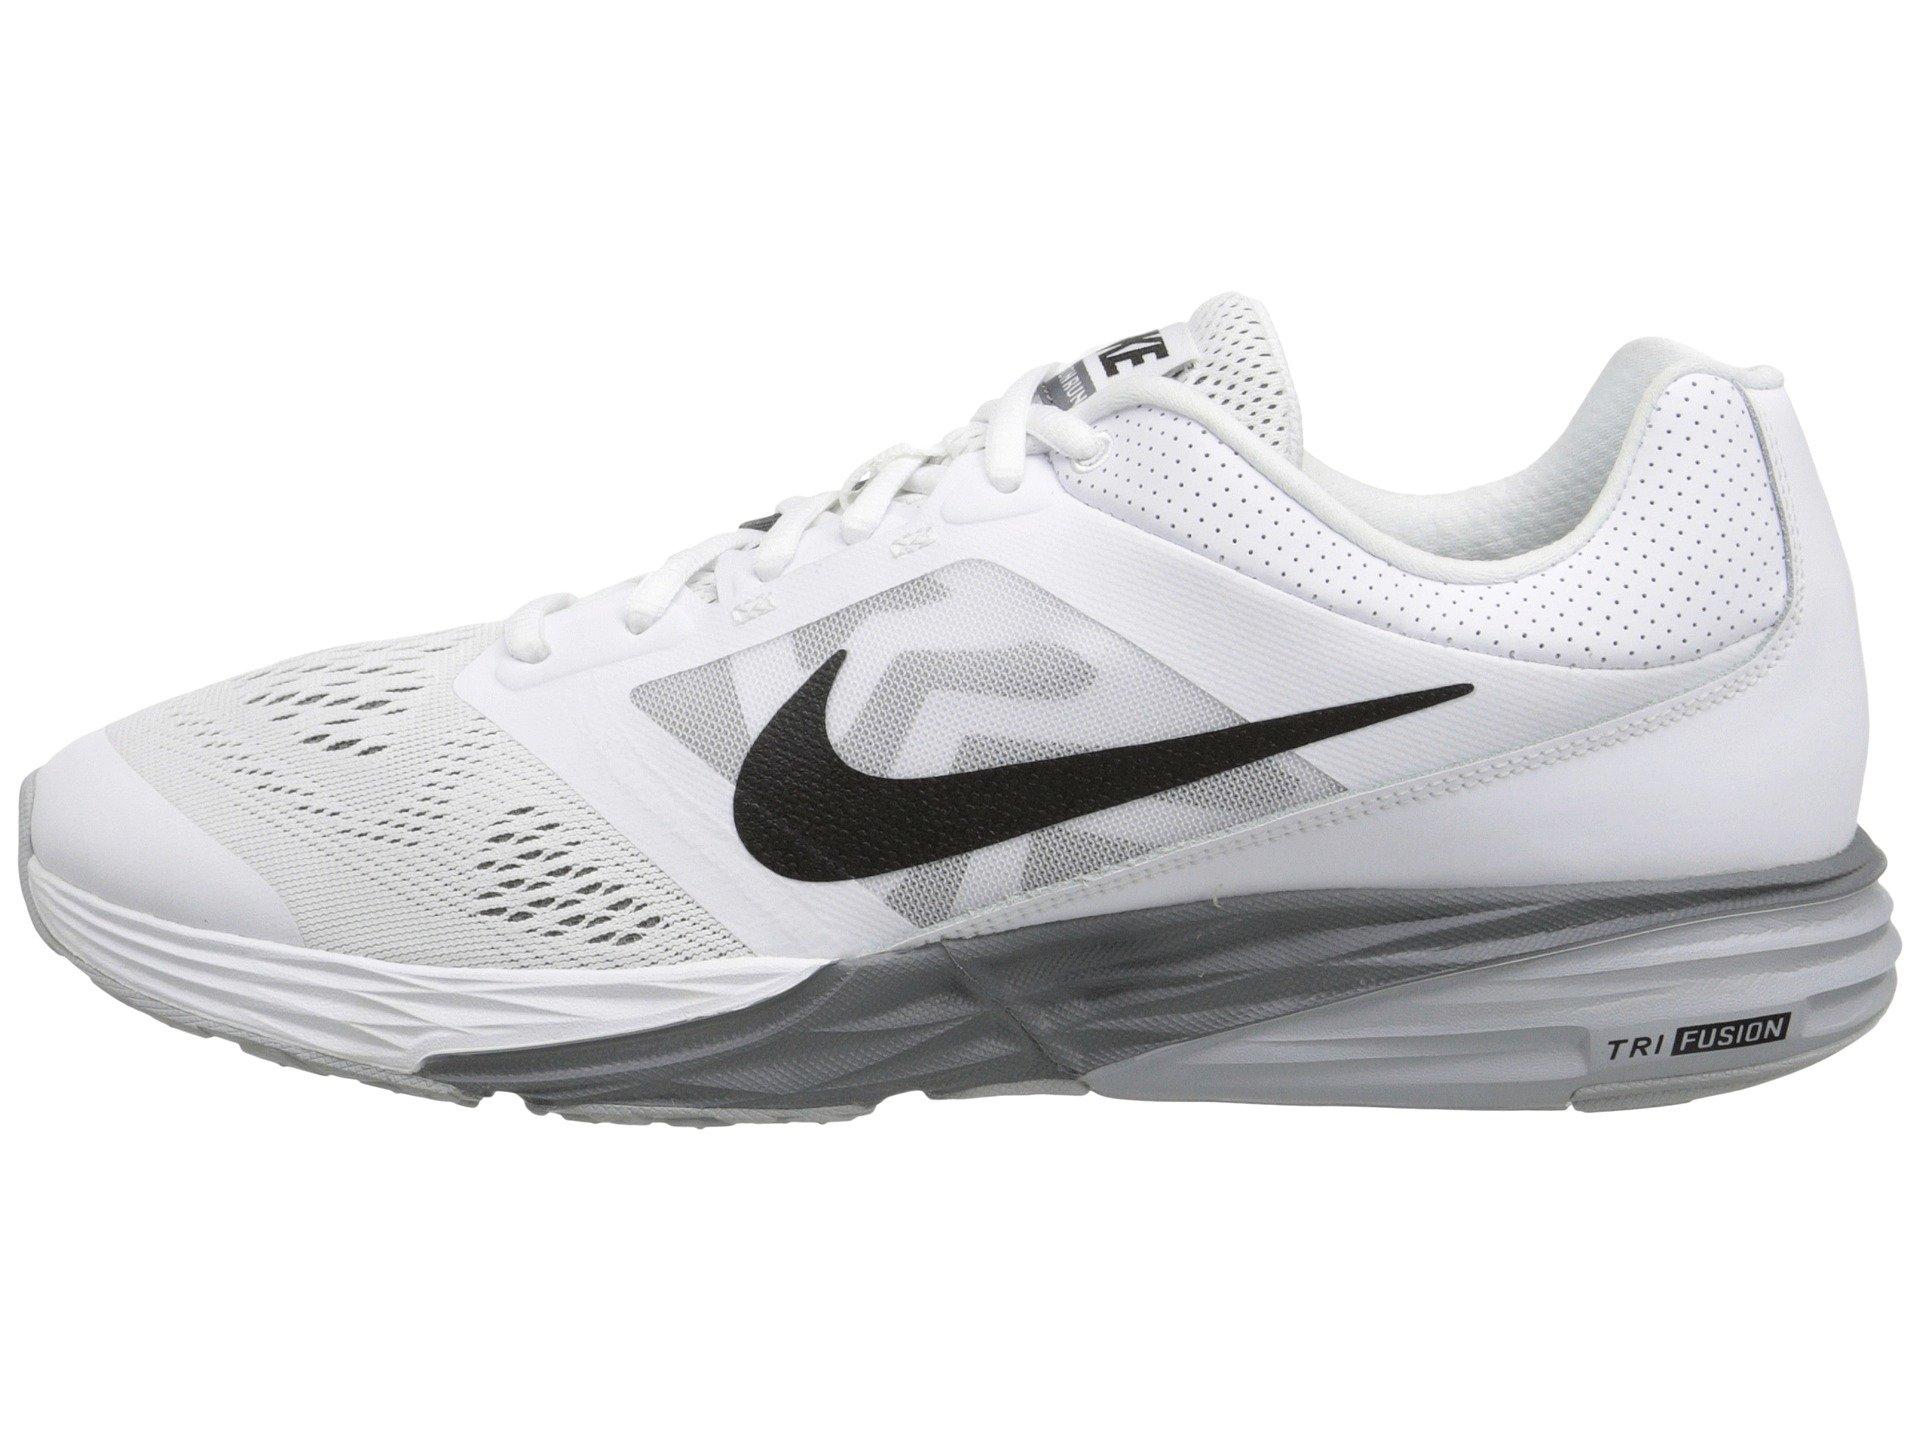 a2bab7c8b5e8 Lyst - Nike Tri Fusion Run in White for Men